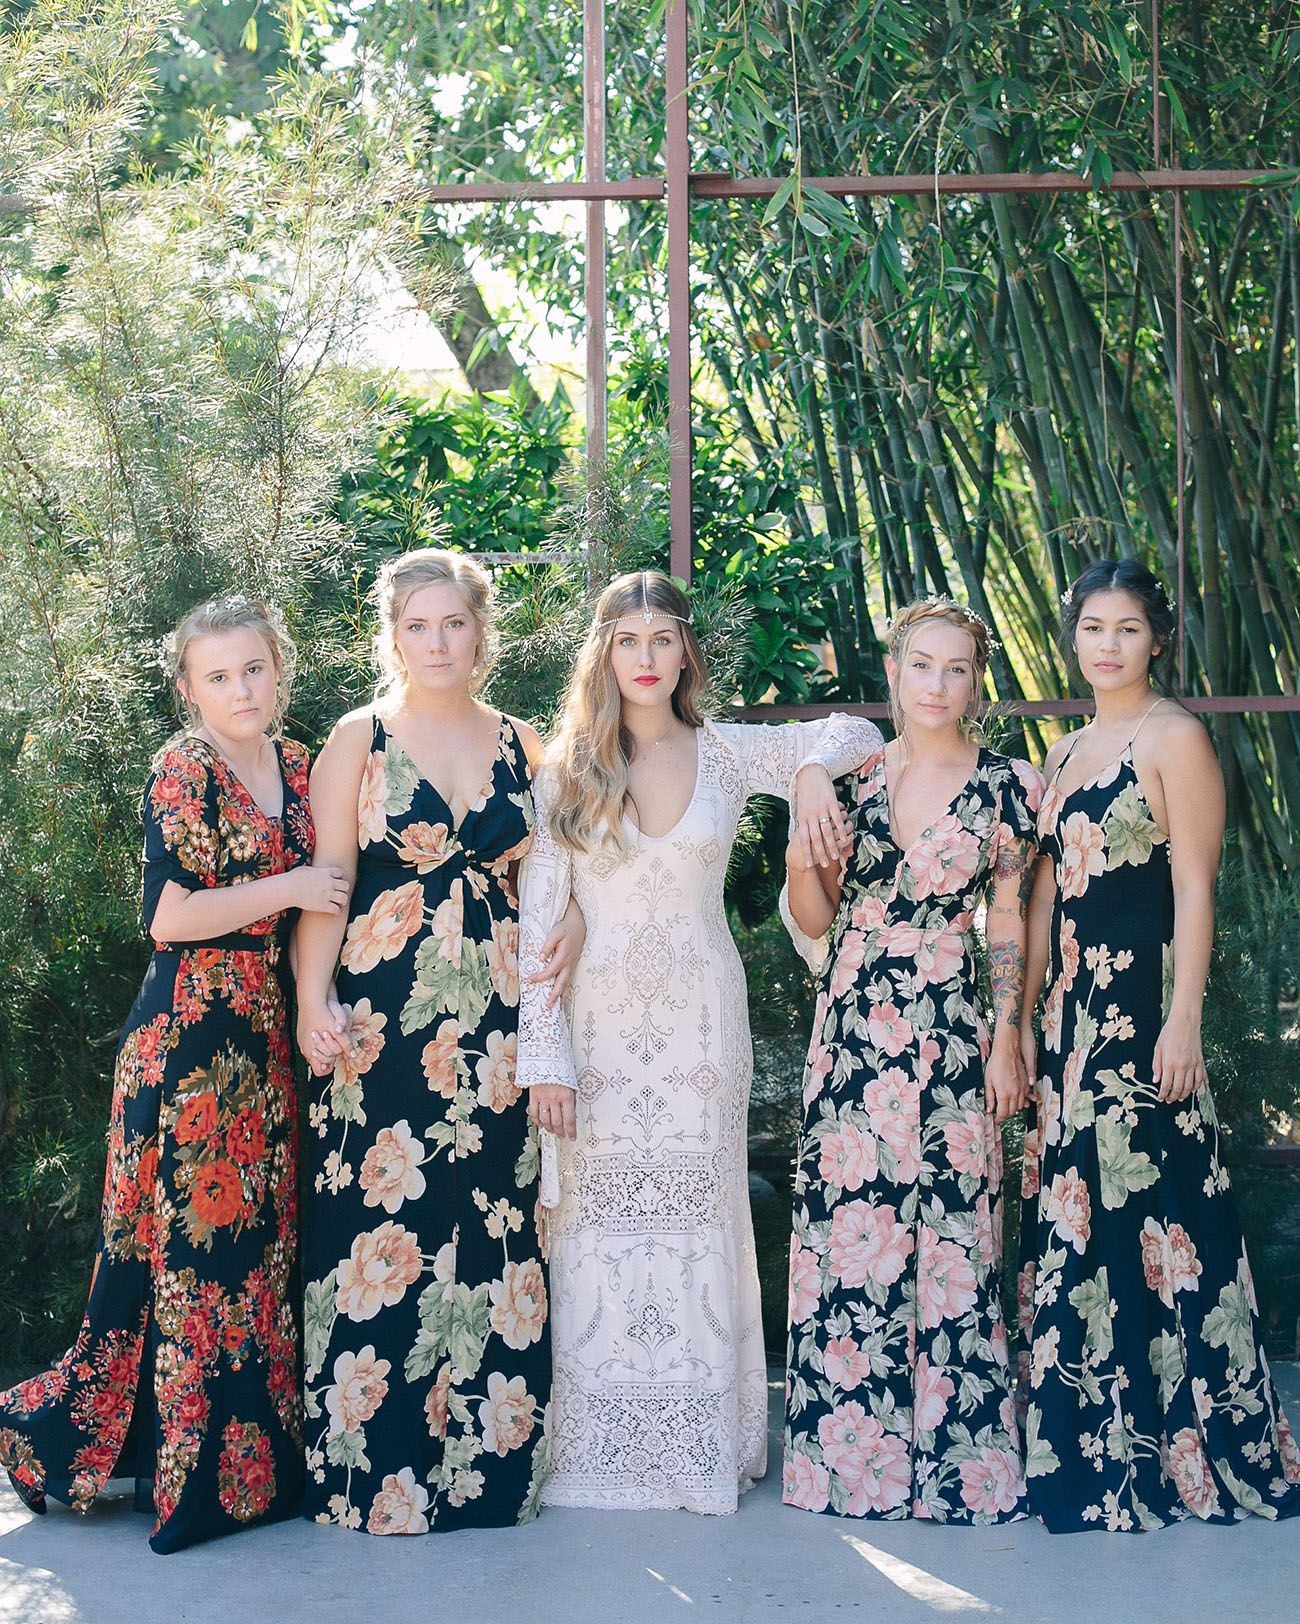 Urban Chic Los Angeles Wedding Haley Austin Green Wedding Shoes Floral Bridesmaid Dresses Bridesmaid Dresses Boho Summer Wedding Attire